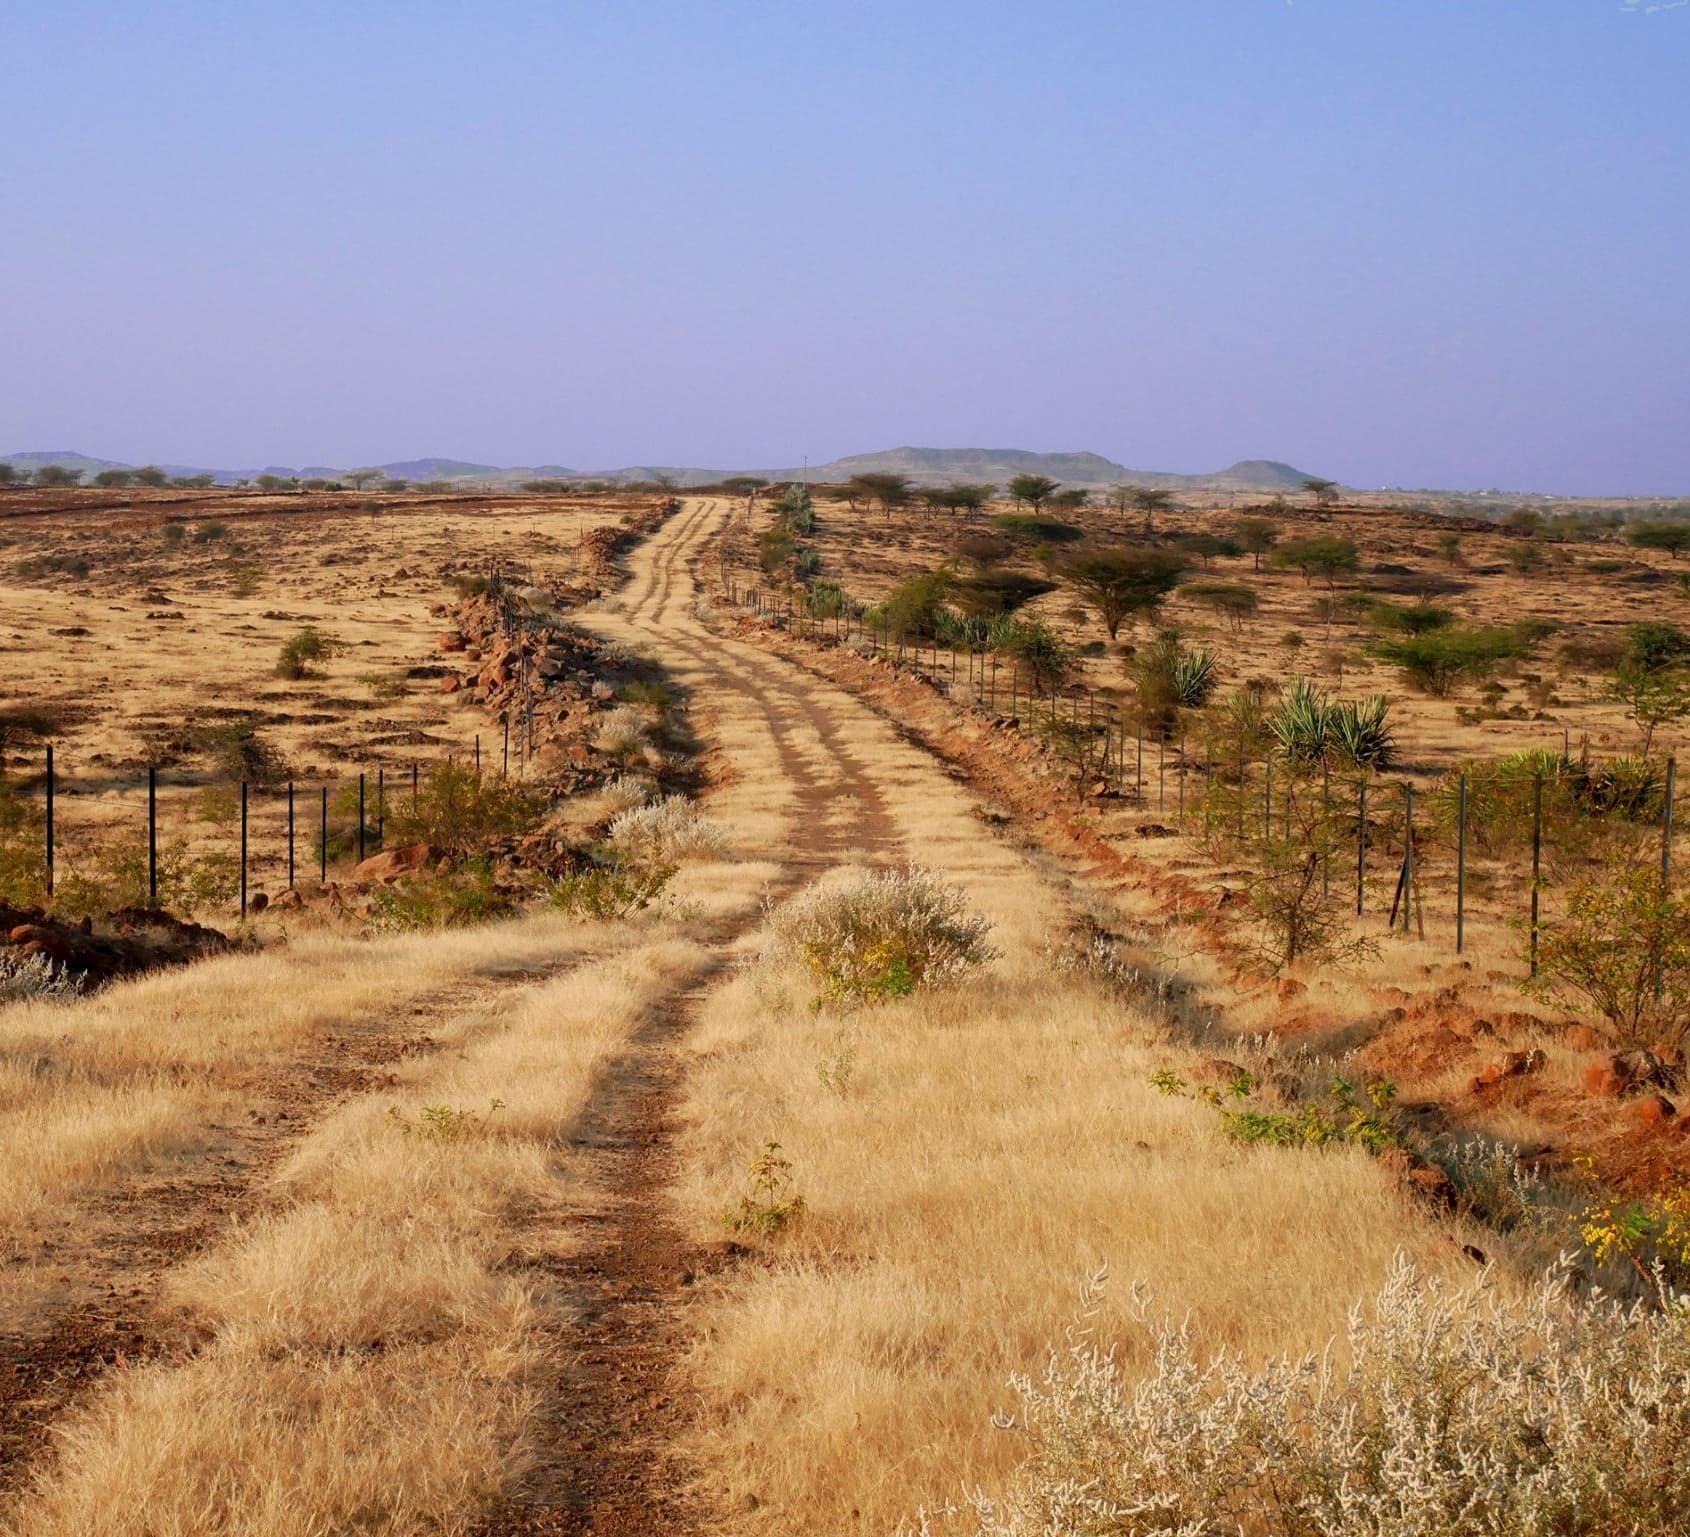 The Wilds of Saswad: The Vibrant Grassland Near Pune